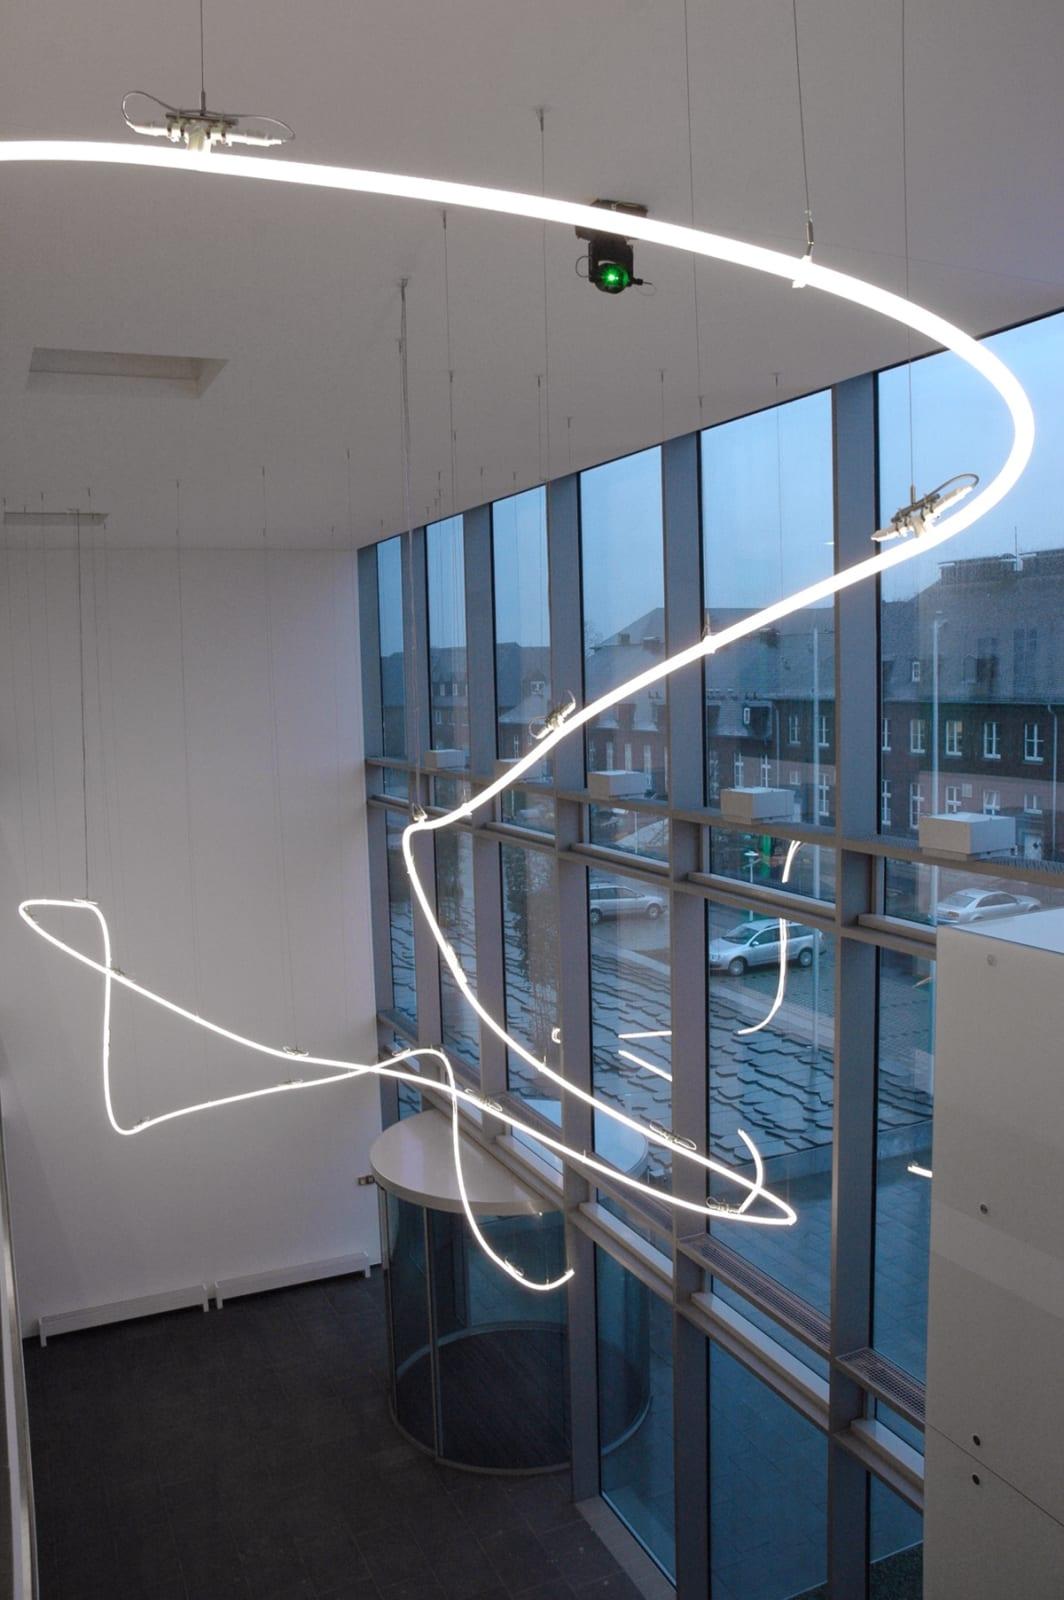 Permanent Installation In vivo - In vitro (2006), Max-Planck-Institute, Münster (2006)   Photo: Steffan Sturm